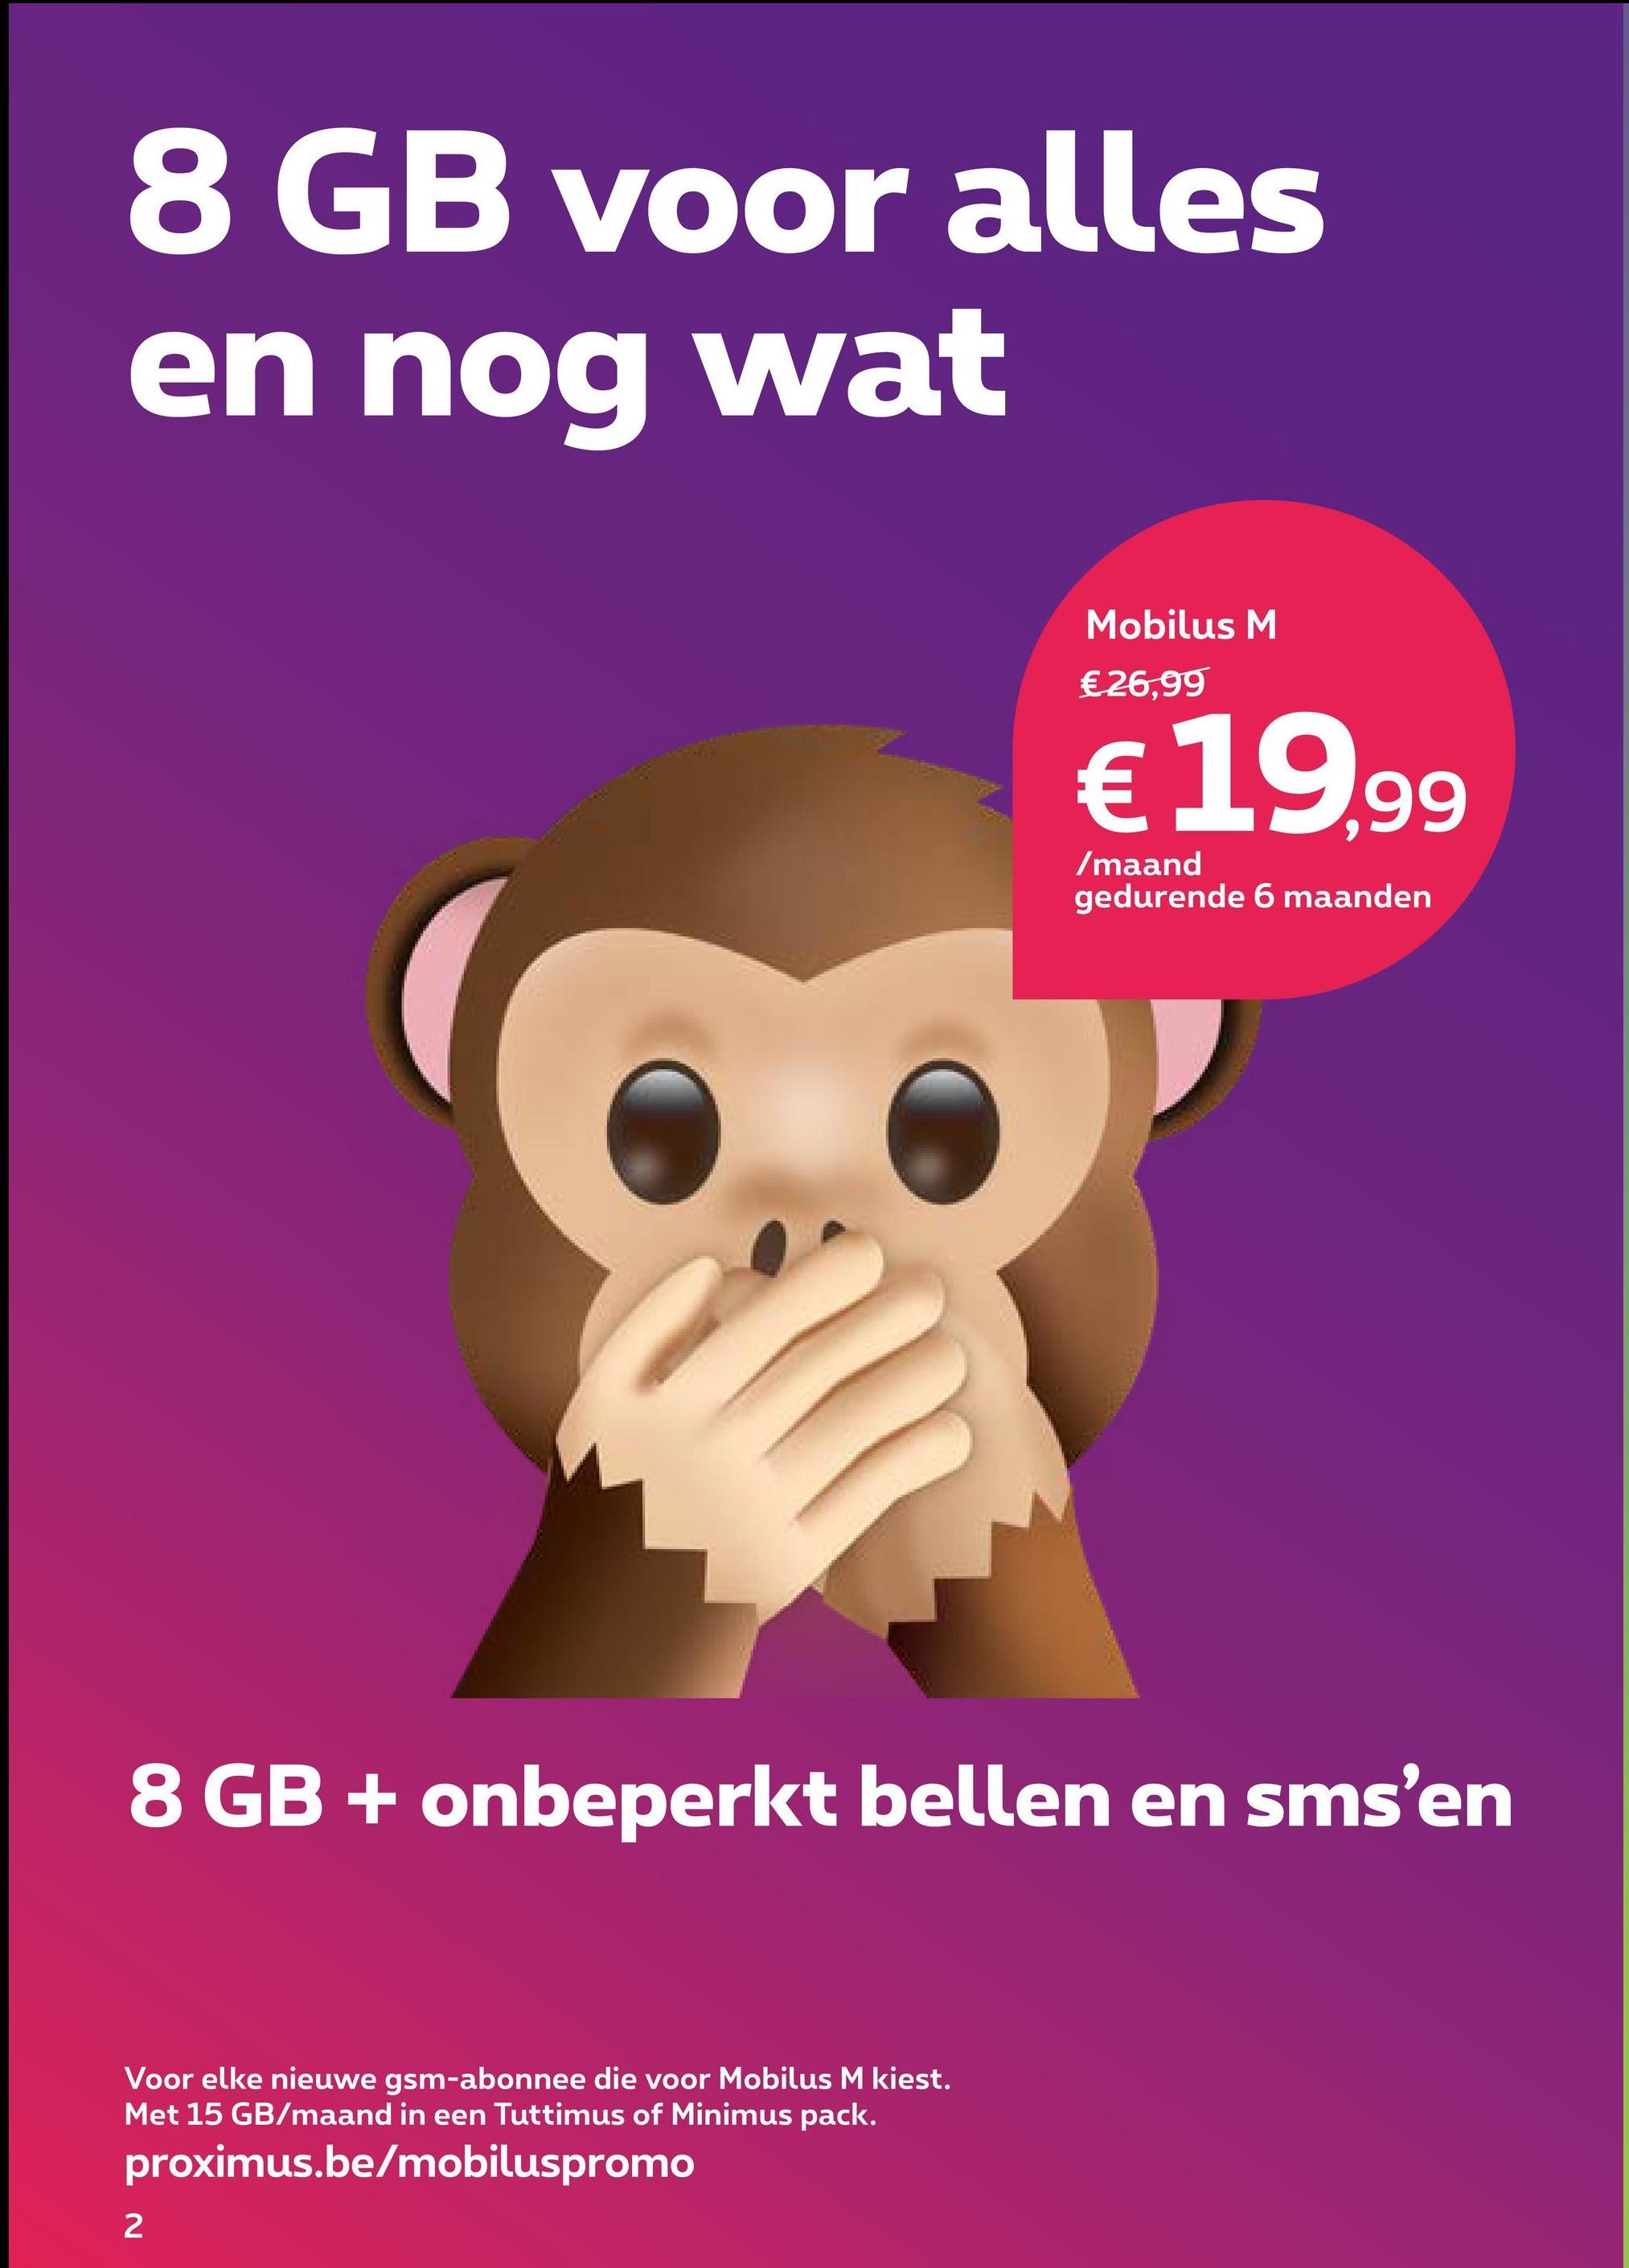 8 GB voor alles en nog wat Mobilus M €26,99 € 19,99 Zmaand gedurende 6 maanden 8 GB + onbeperkt bellen en sms'en Voor elke nieuwe gsm-abonnee die voor Mobilus M kiest. Met 15 GB/maand in een Tuttimus of Minimus pack. proximus.be/mobiluspromo